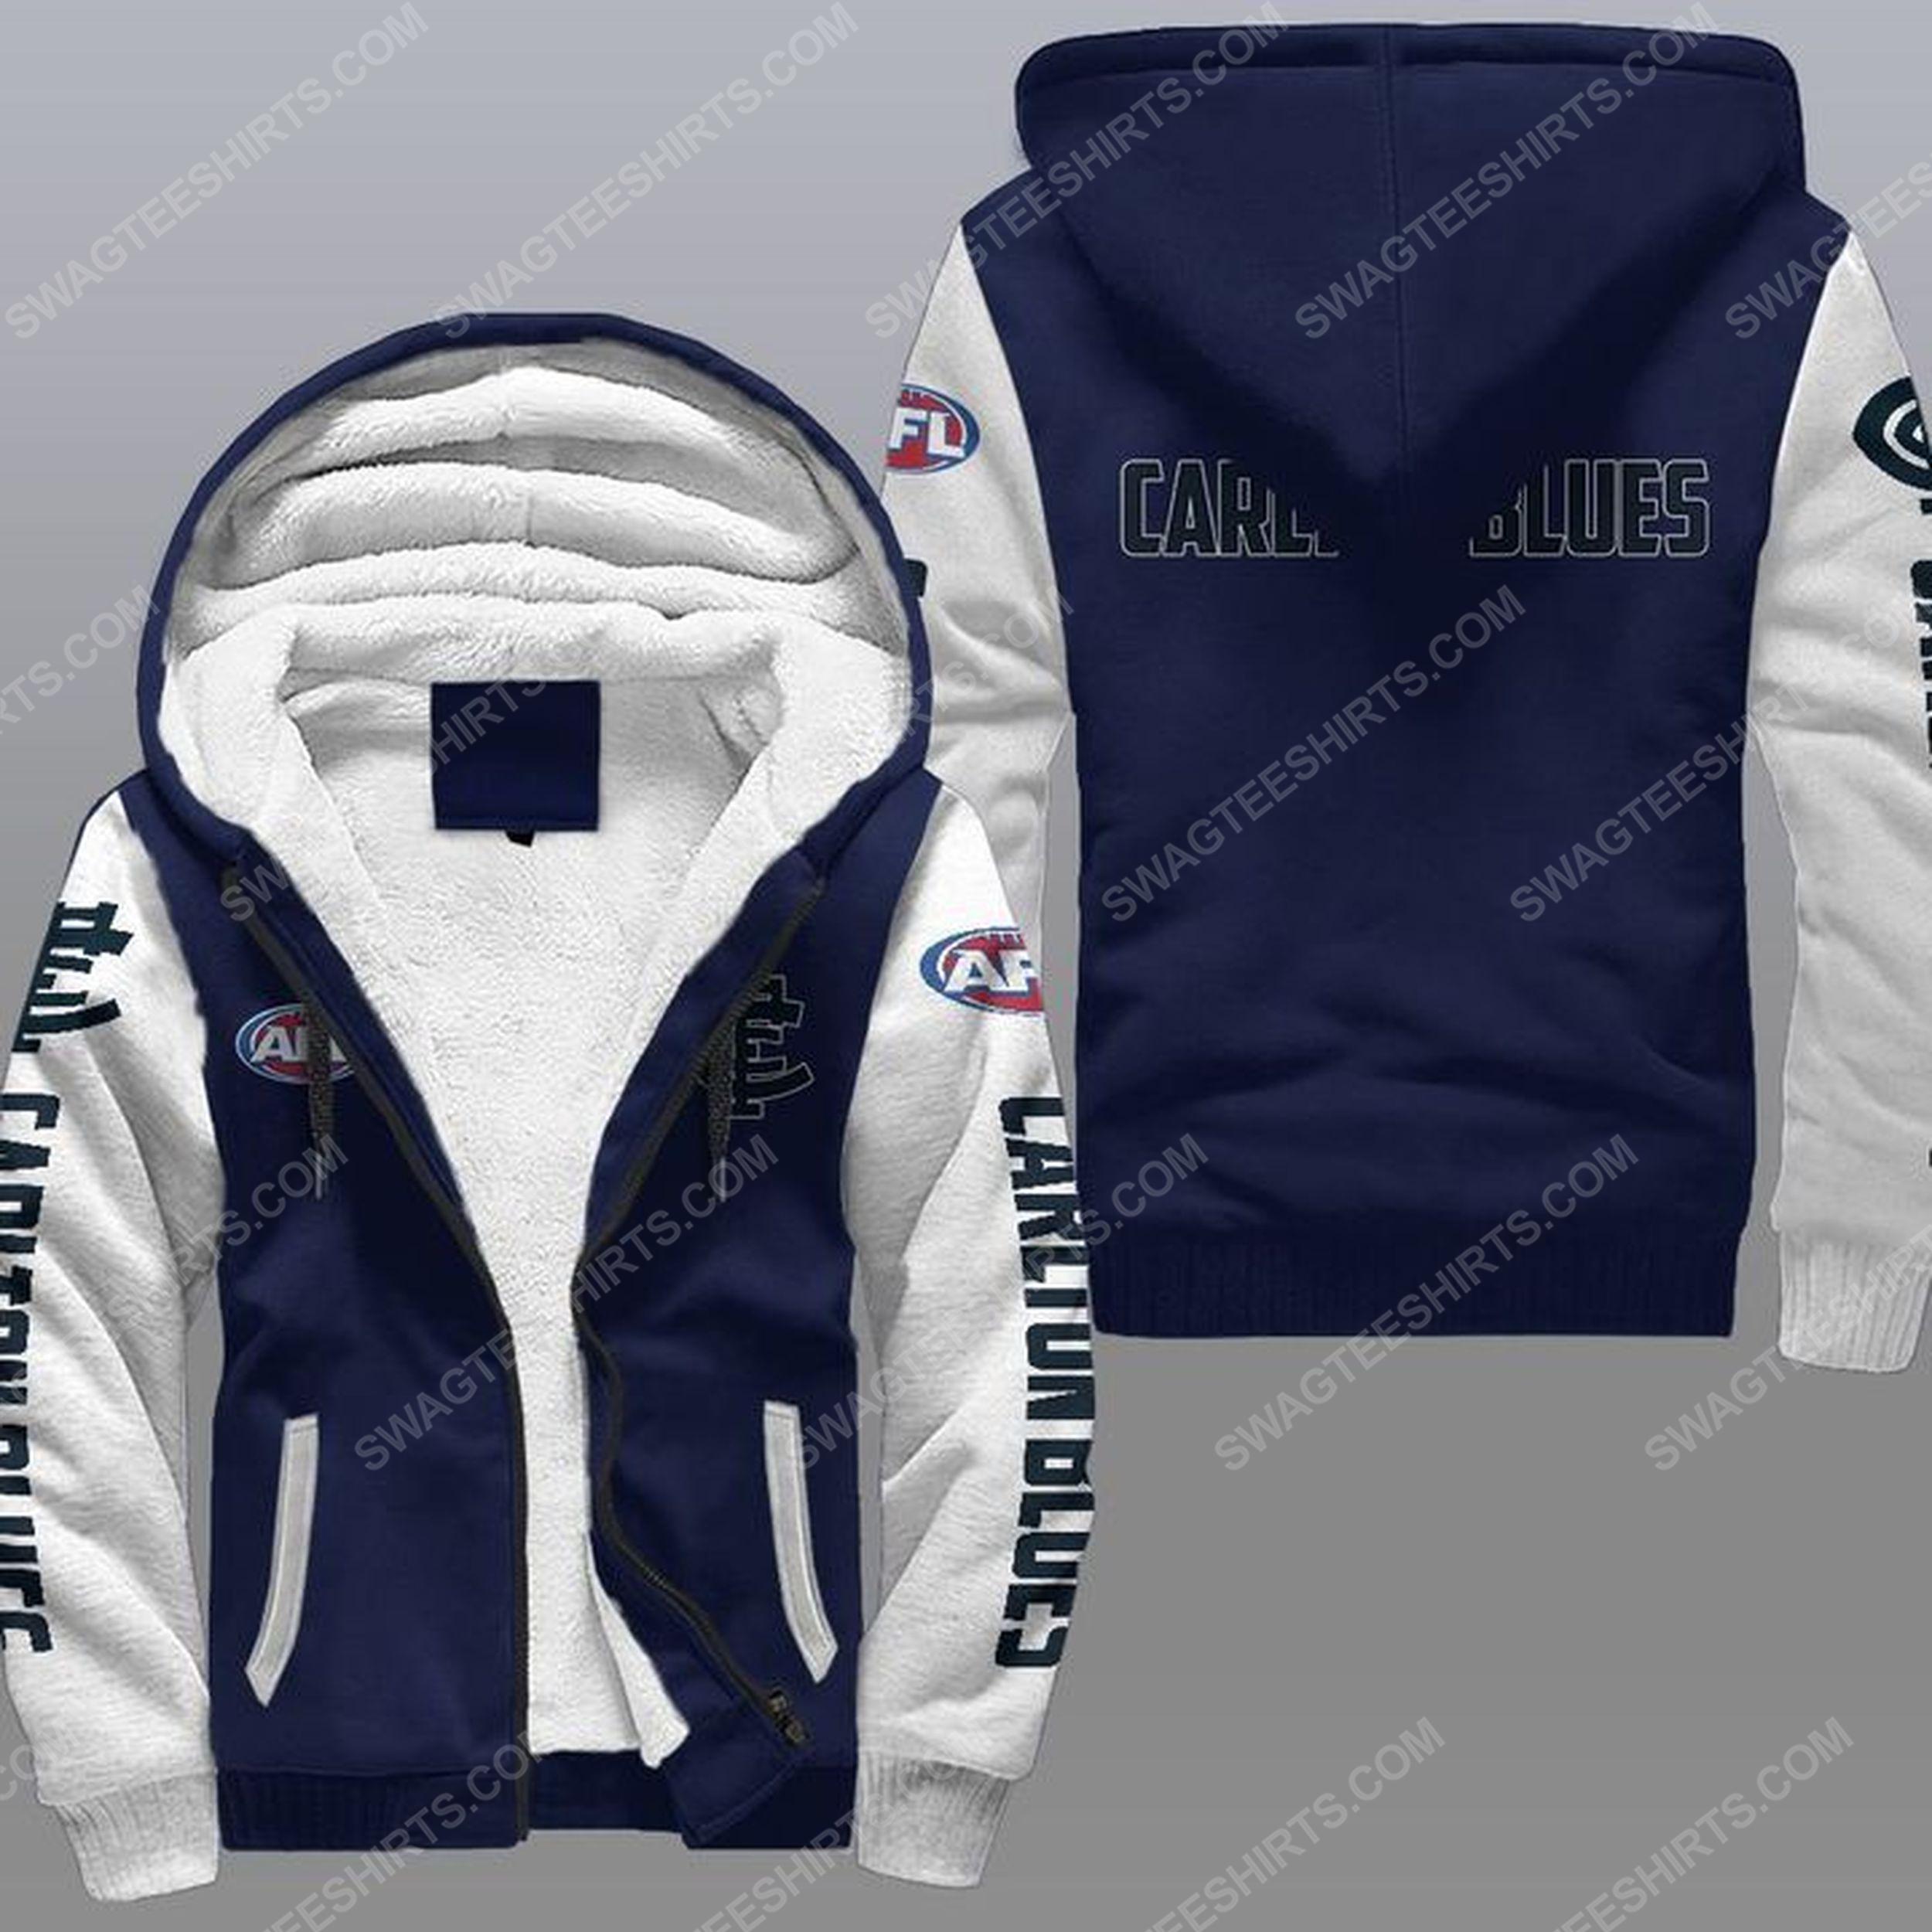 The carlton football club all over print fleece hoodie - navy 1